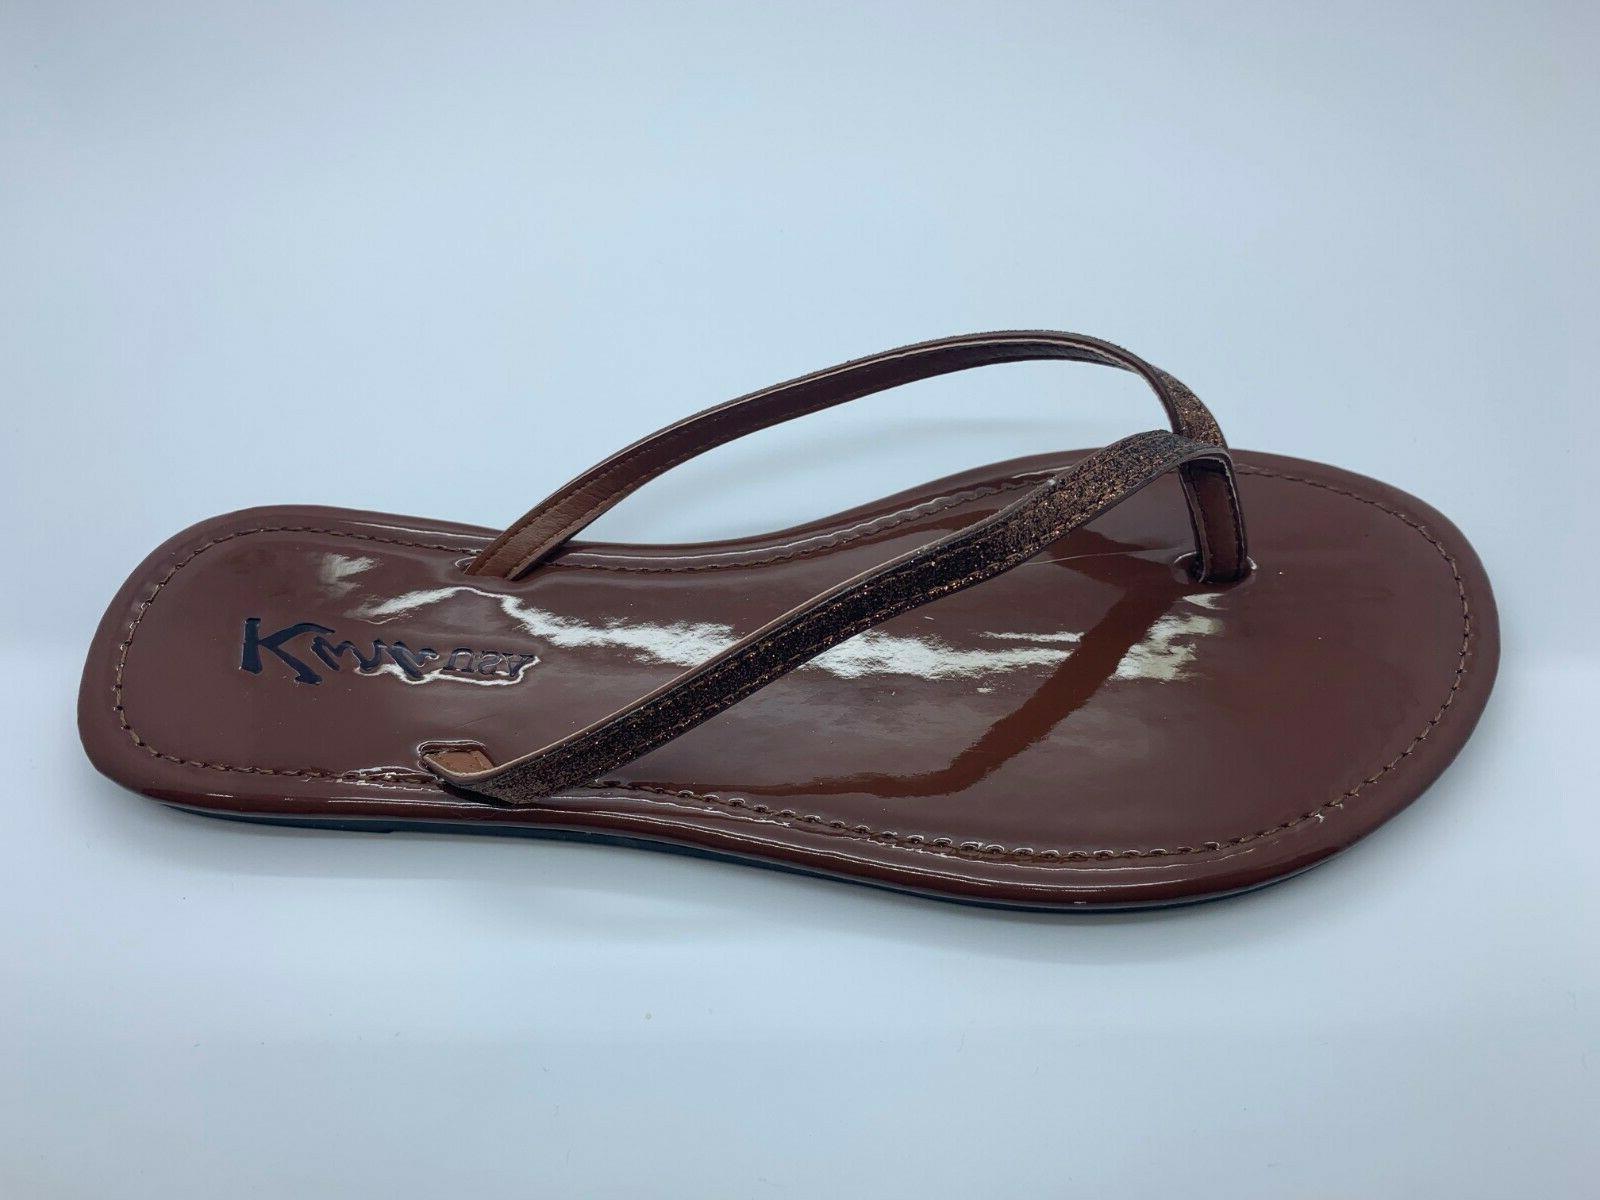 New Women Flops Sandals Thong Slipper Shoes Size